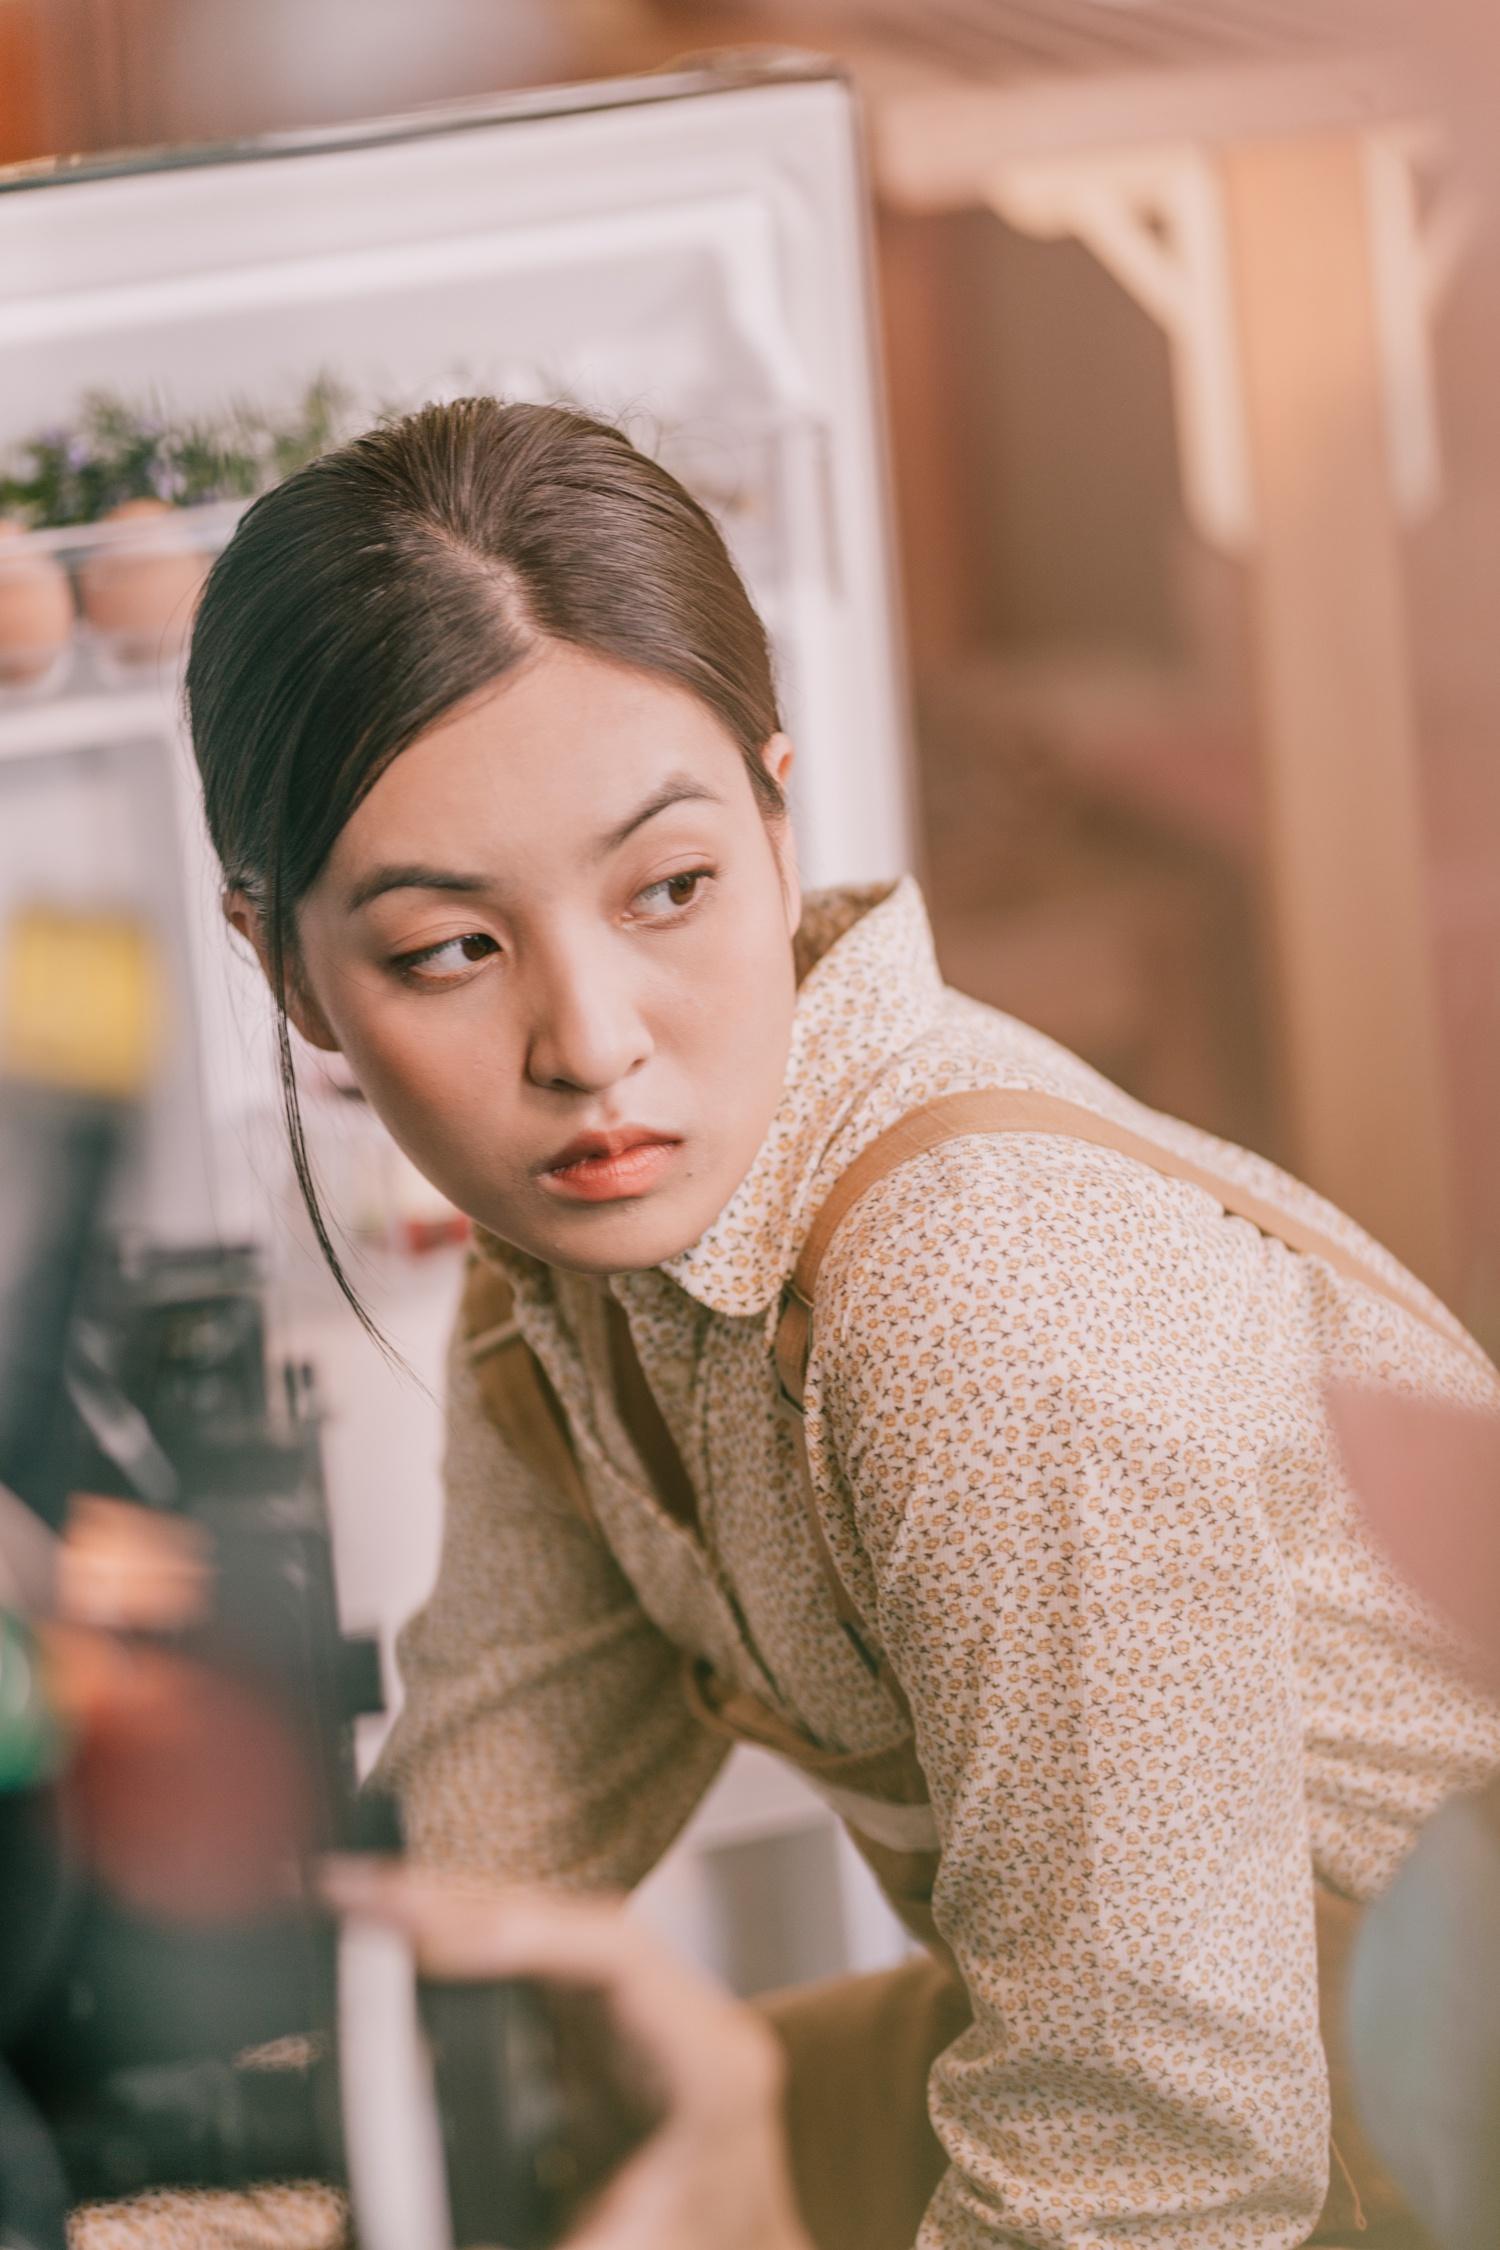 Nhan sac hot girl 'Mat biec' trong lan dau dong MV hinh anh 7 thao_tam9.jpg